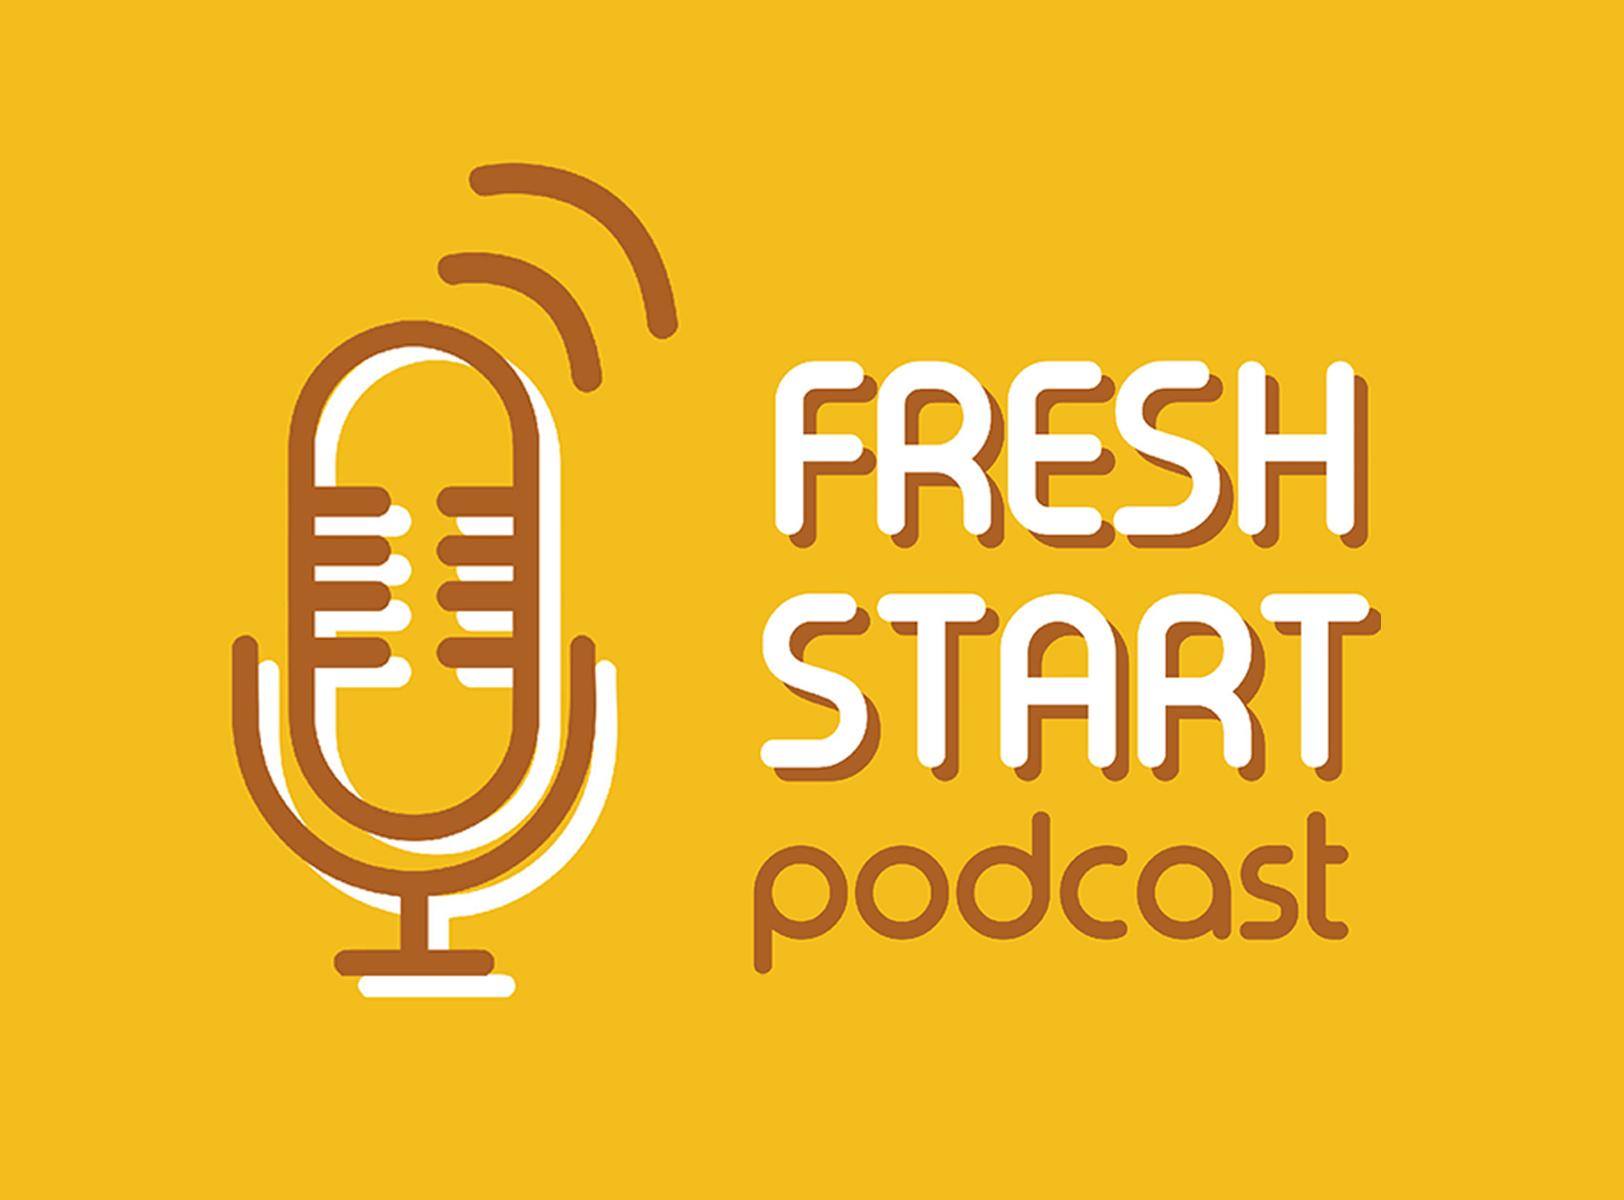 Fresh Start: Podcast News (7/5/2019 Fri.)